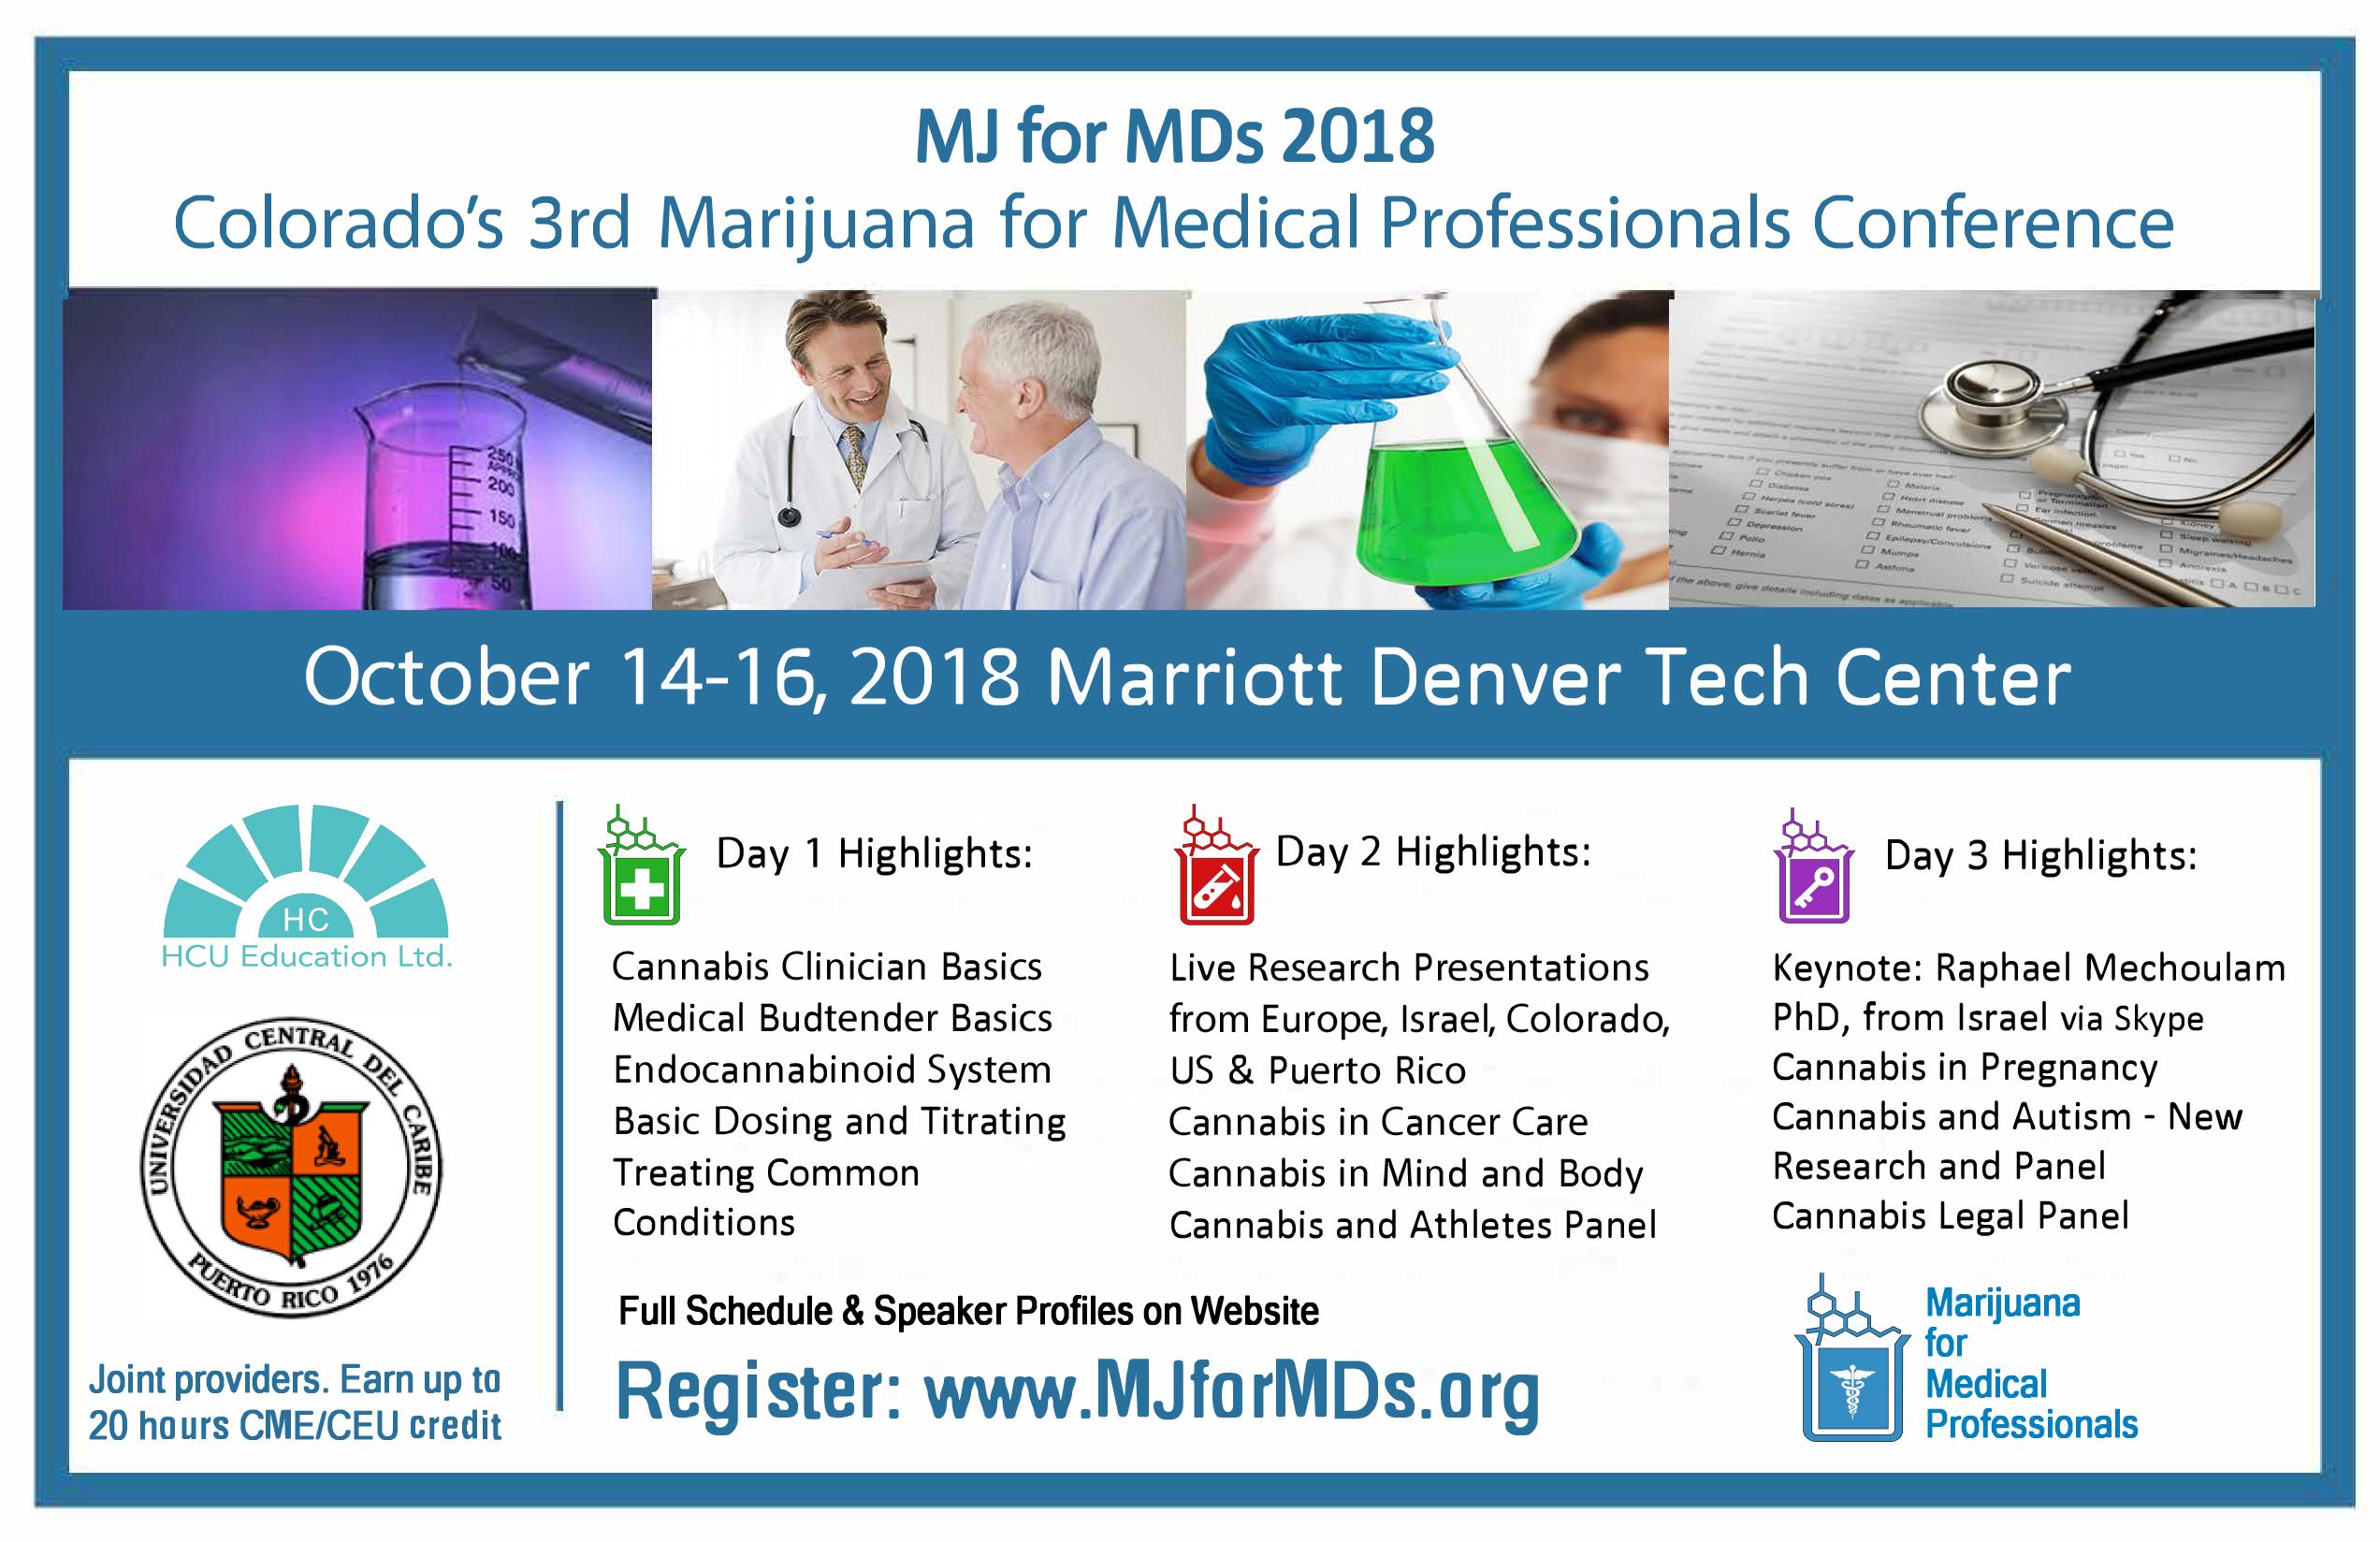 Marijuana for Medical Professionals III Conference 2018